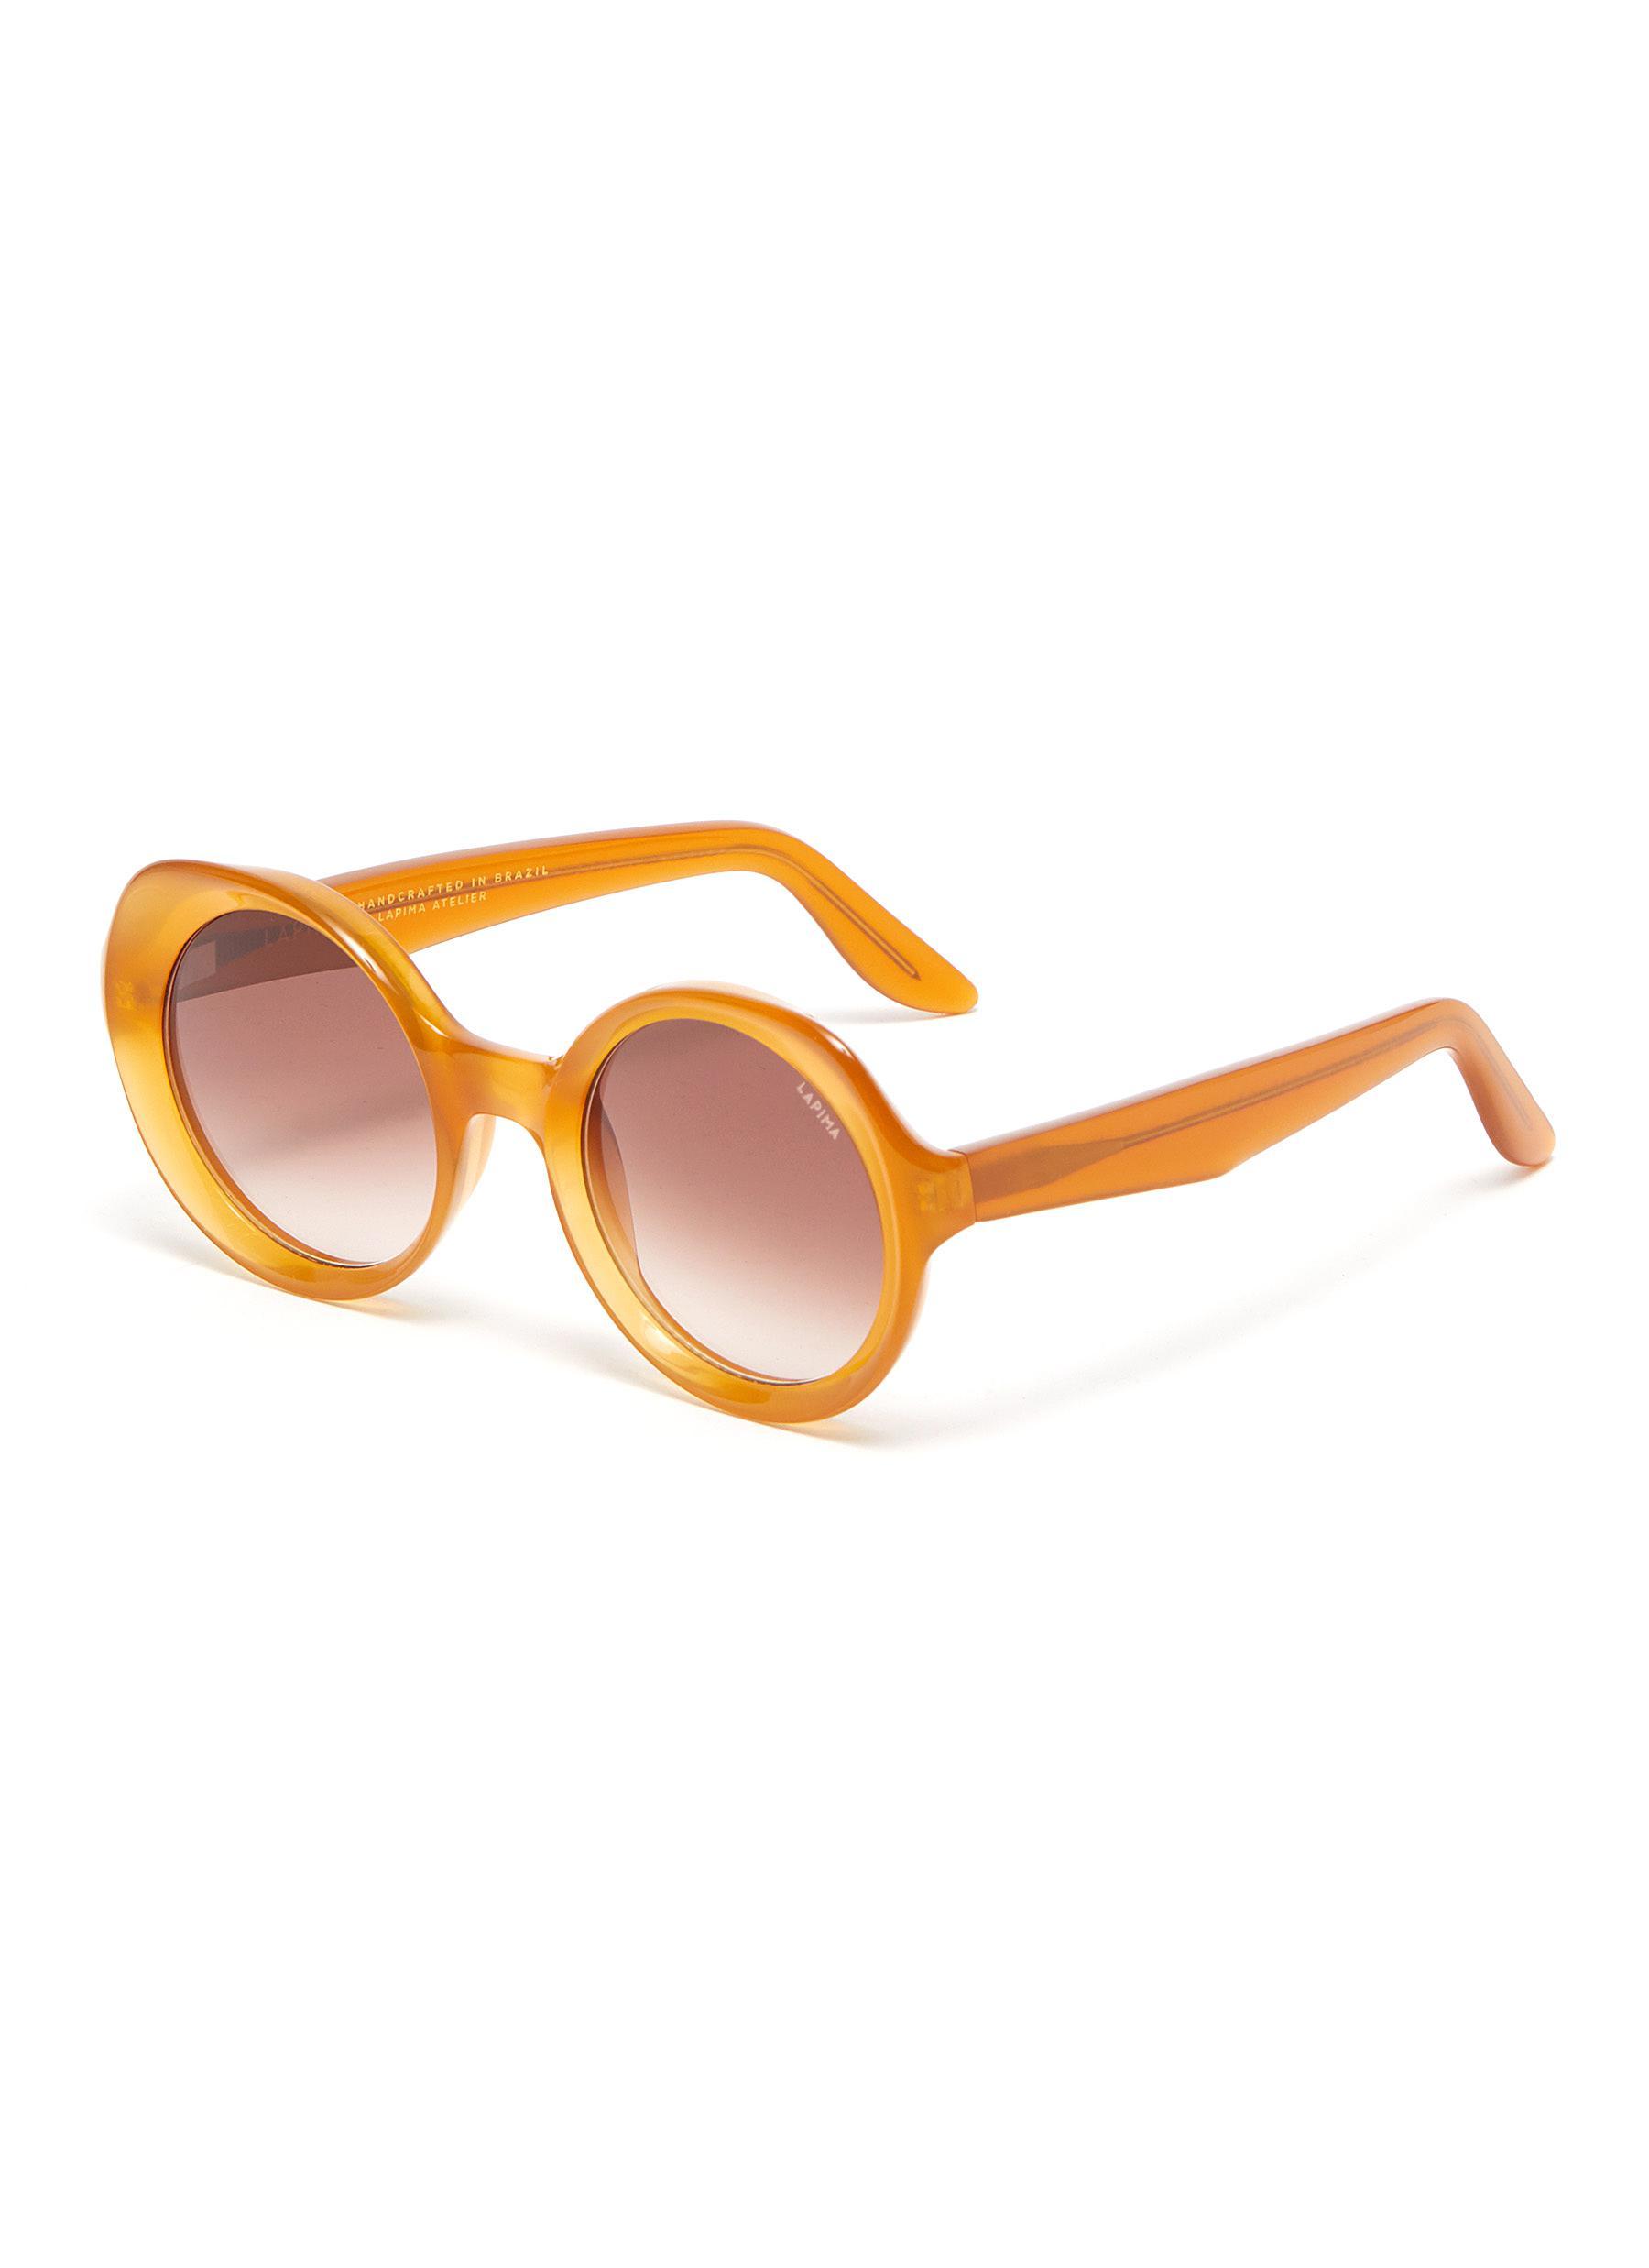 'Carlota' Round Acetate Frame Sunglasses